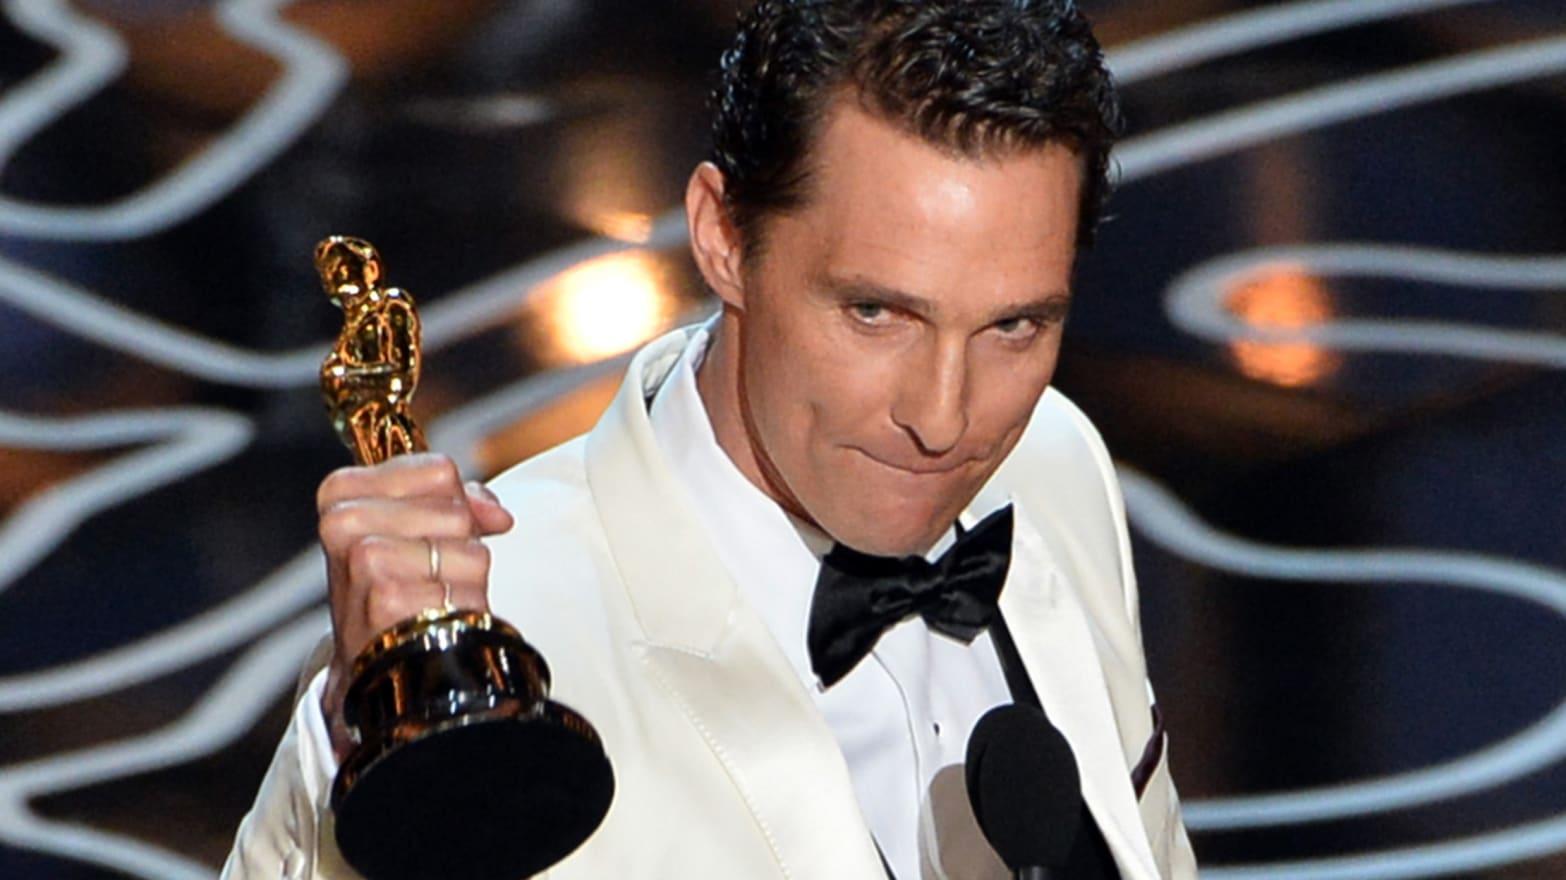 Inspirational Oscar Speech – Matthew McConaughey